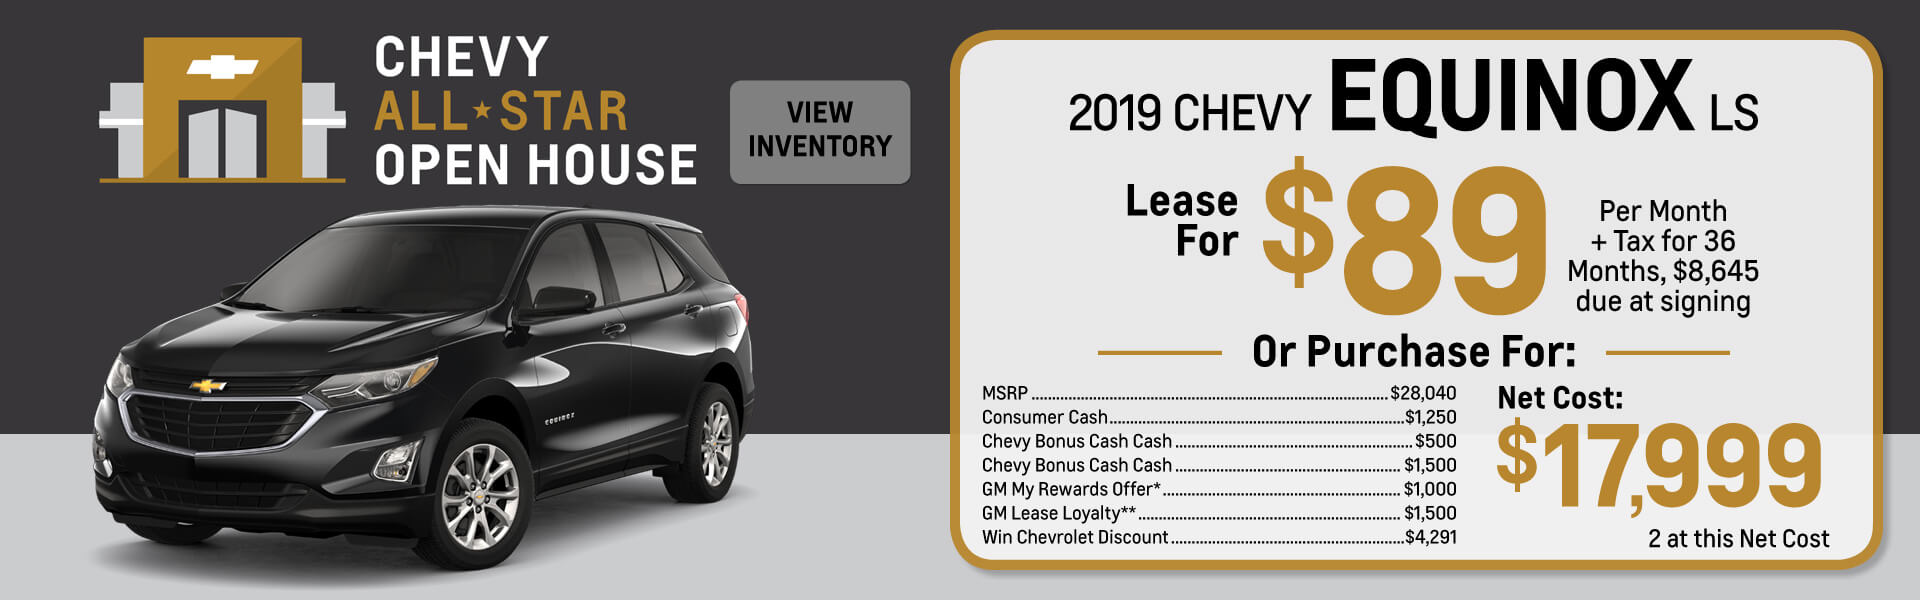 New & Used Chevrolet Dealer | Long Beach, Torrance & Los Angeles